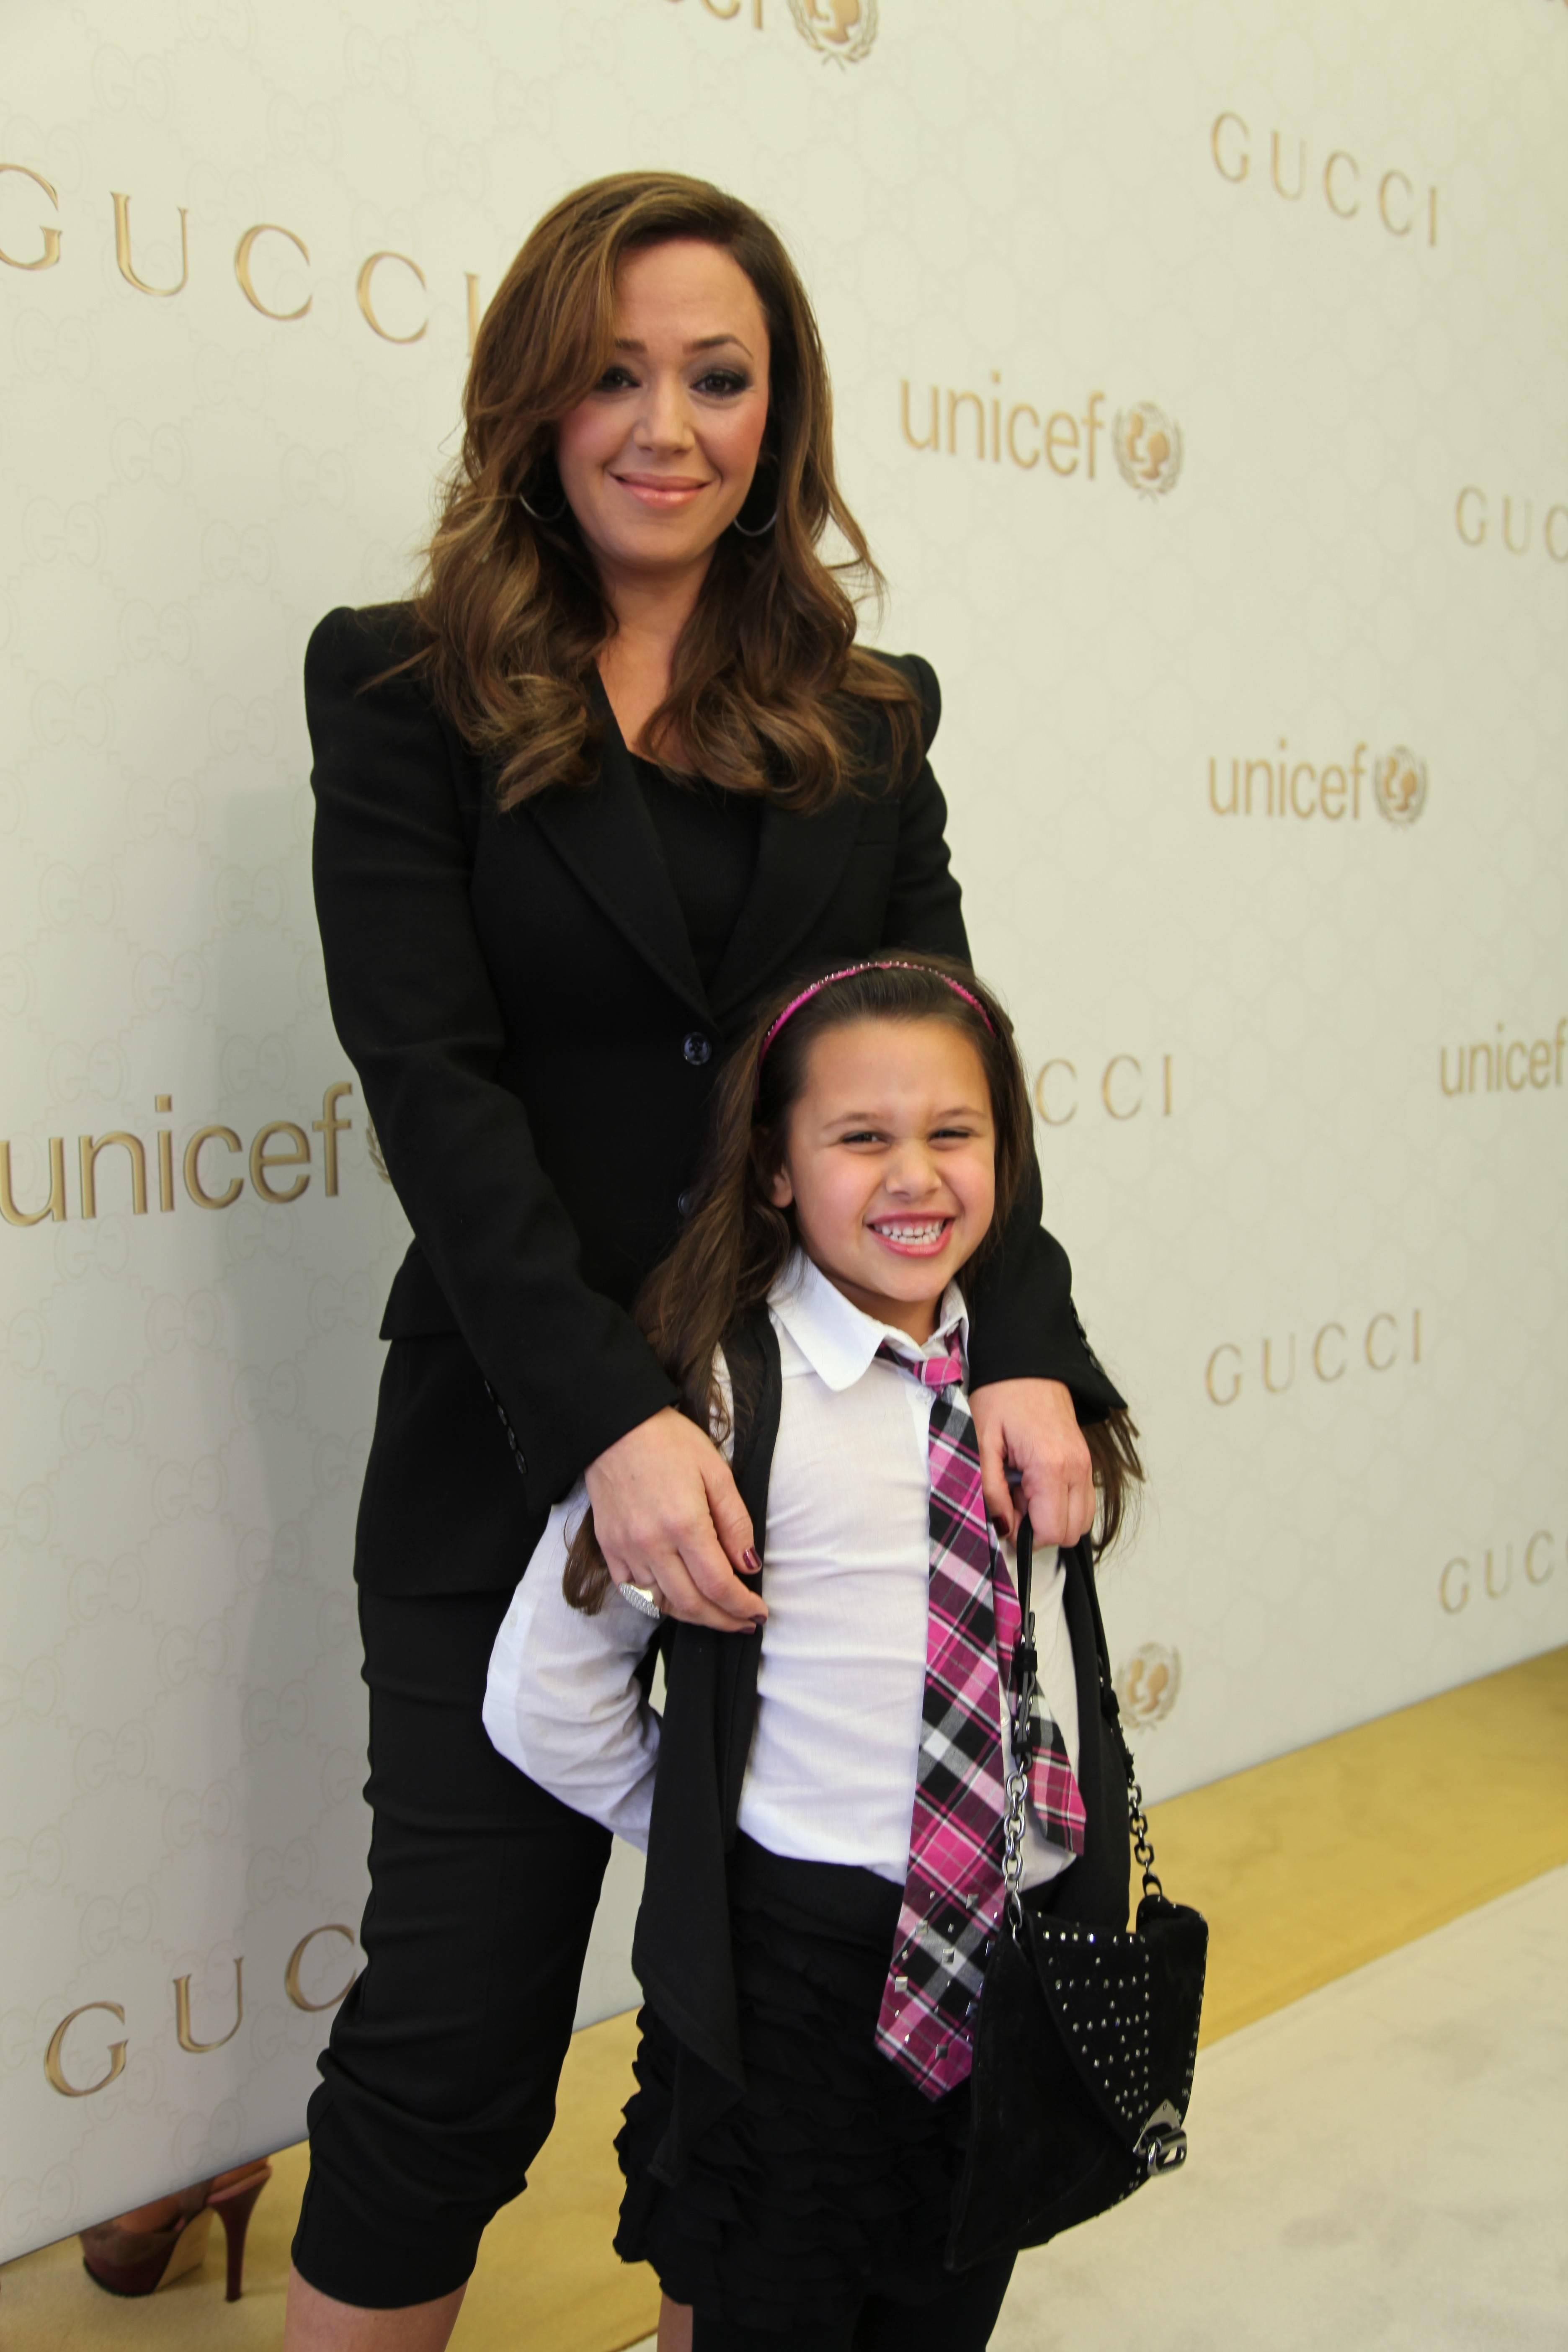 Leah Remini and daughter Sofia